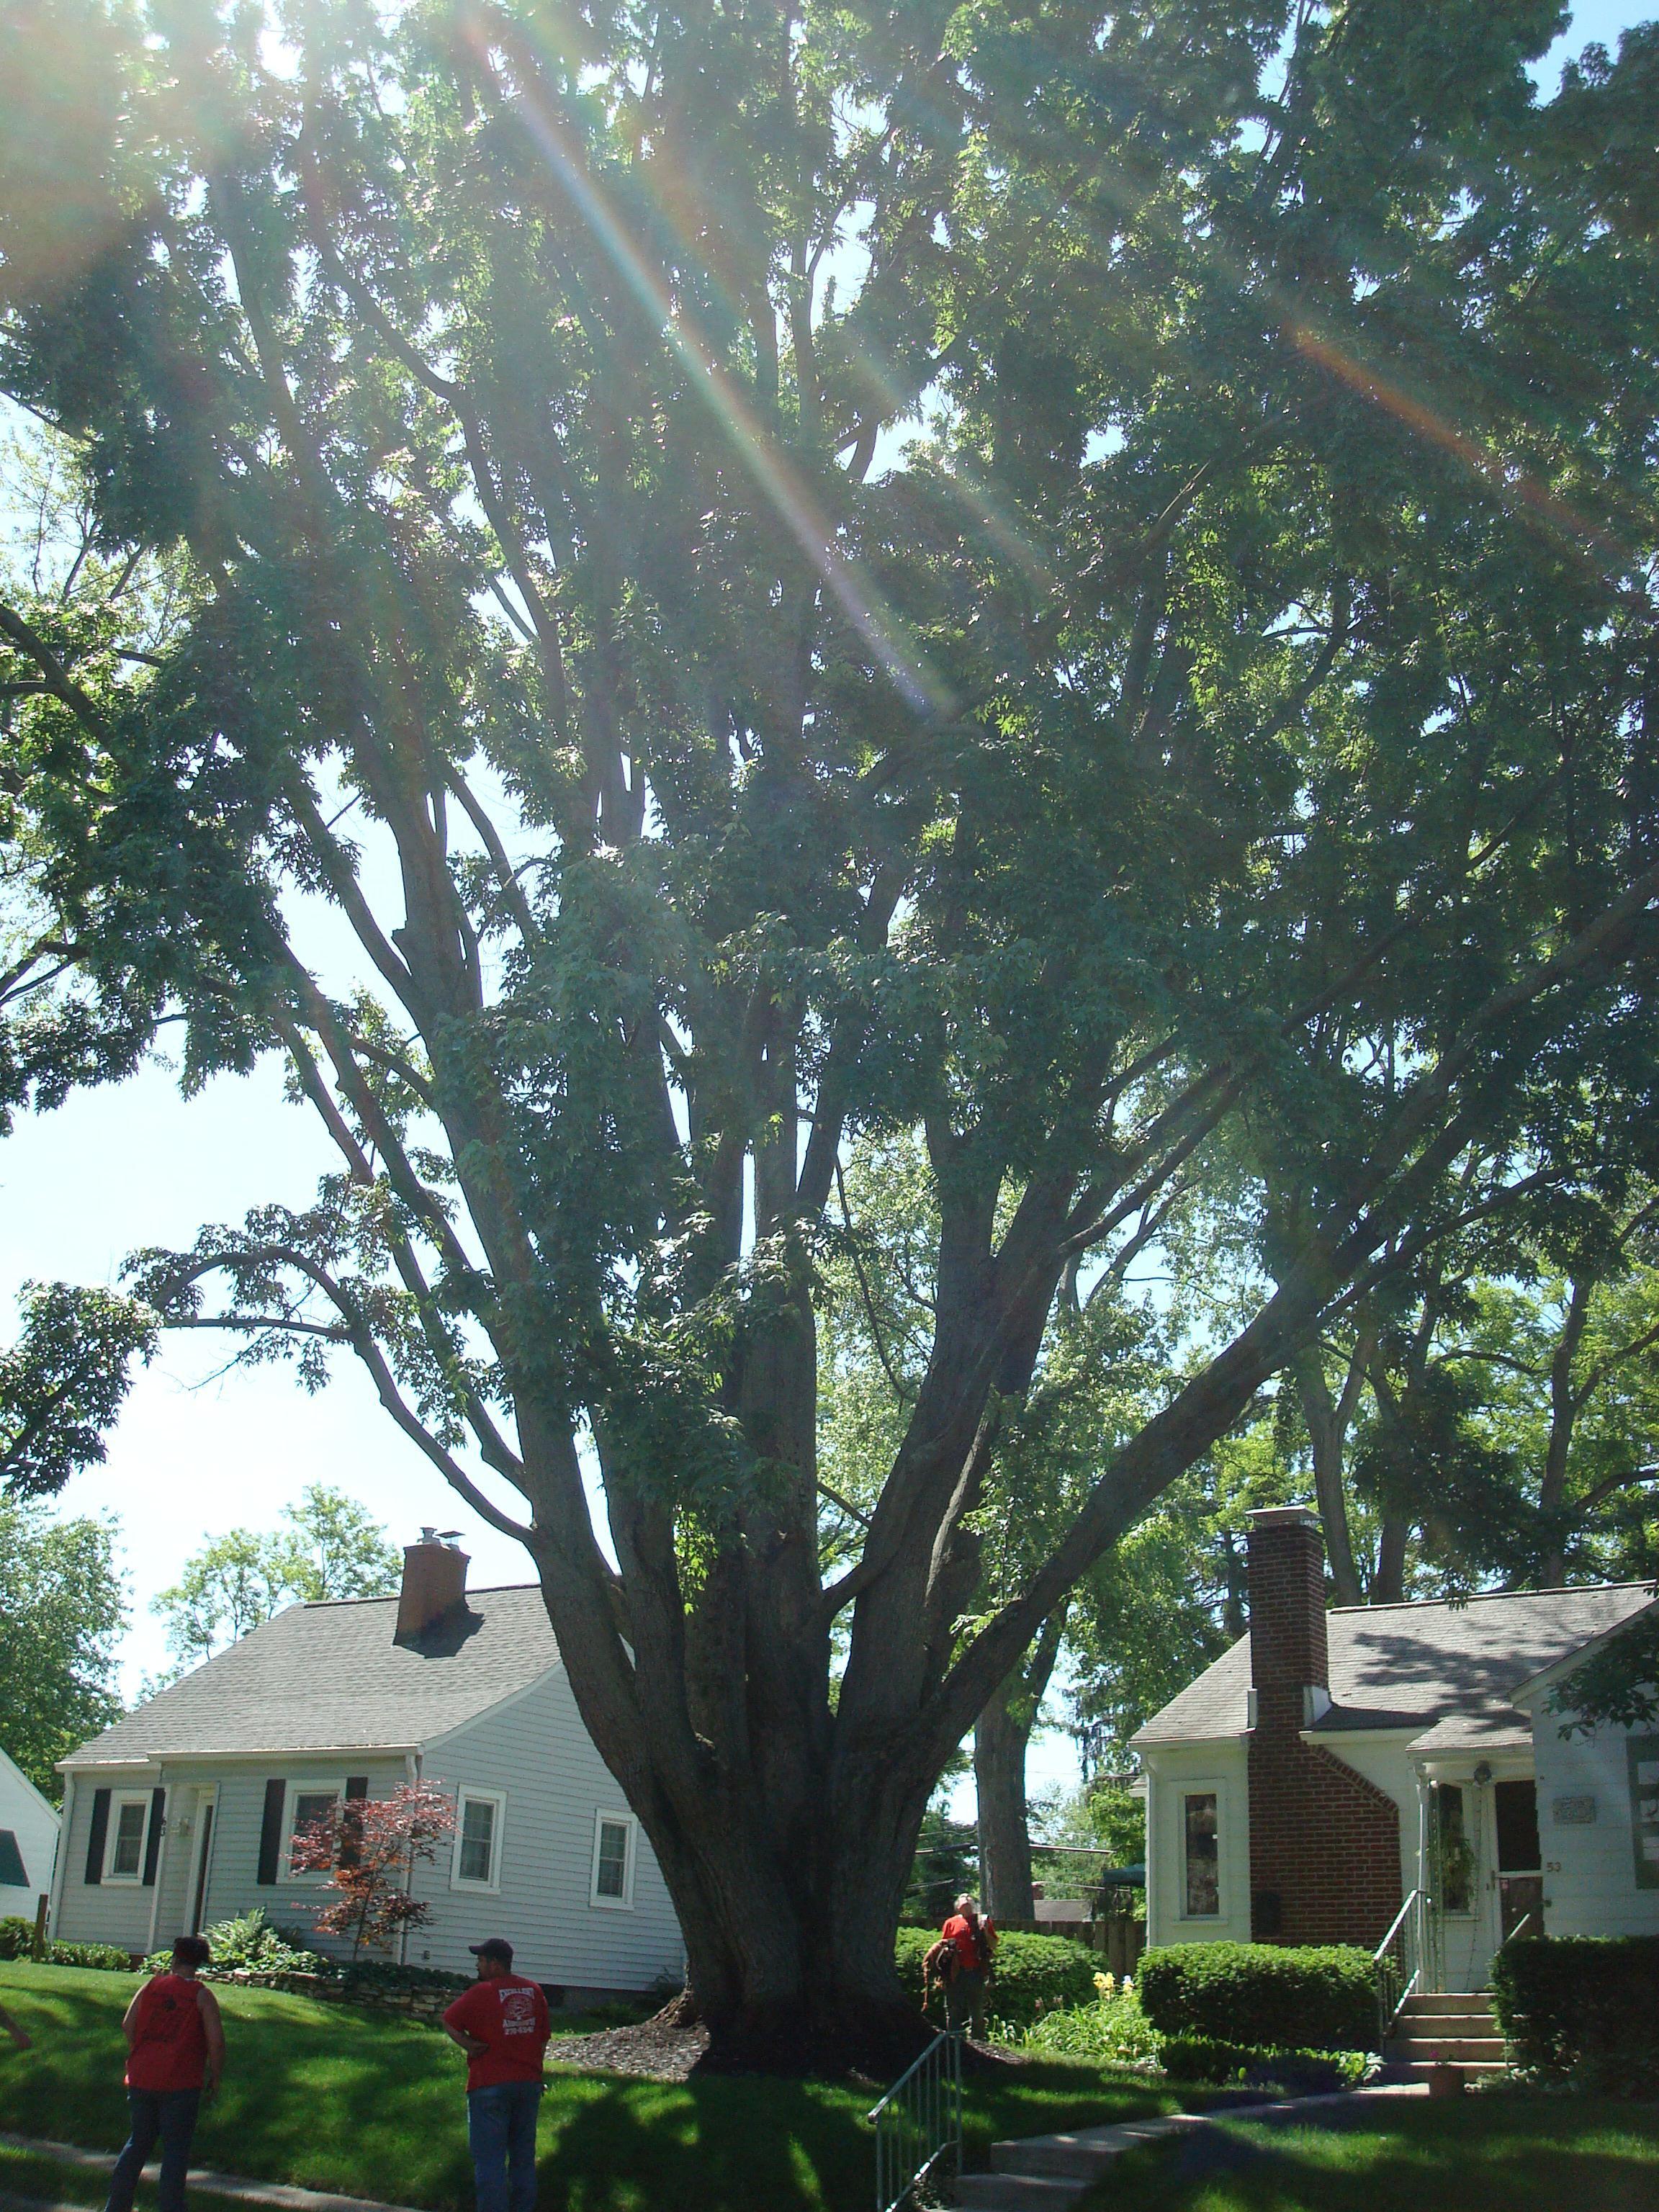 22 Wonderful Book Of Tree Services Columbus U2013 Dototday.com